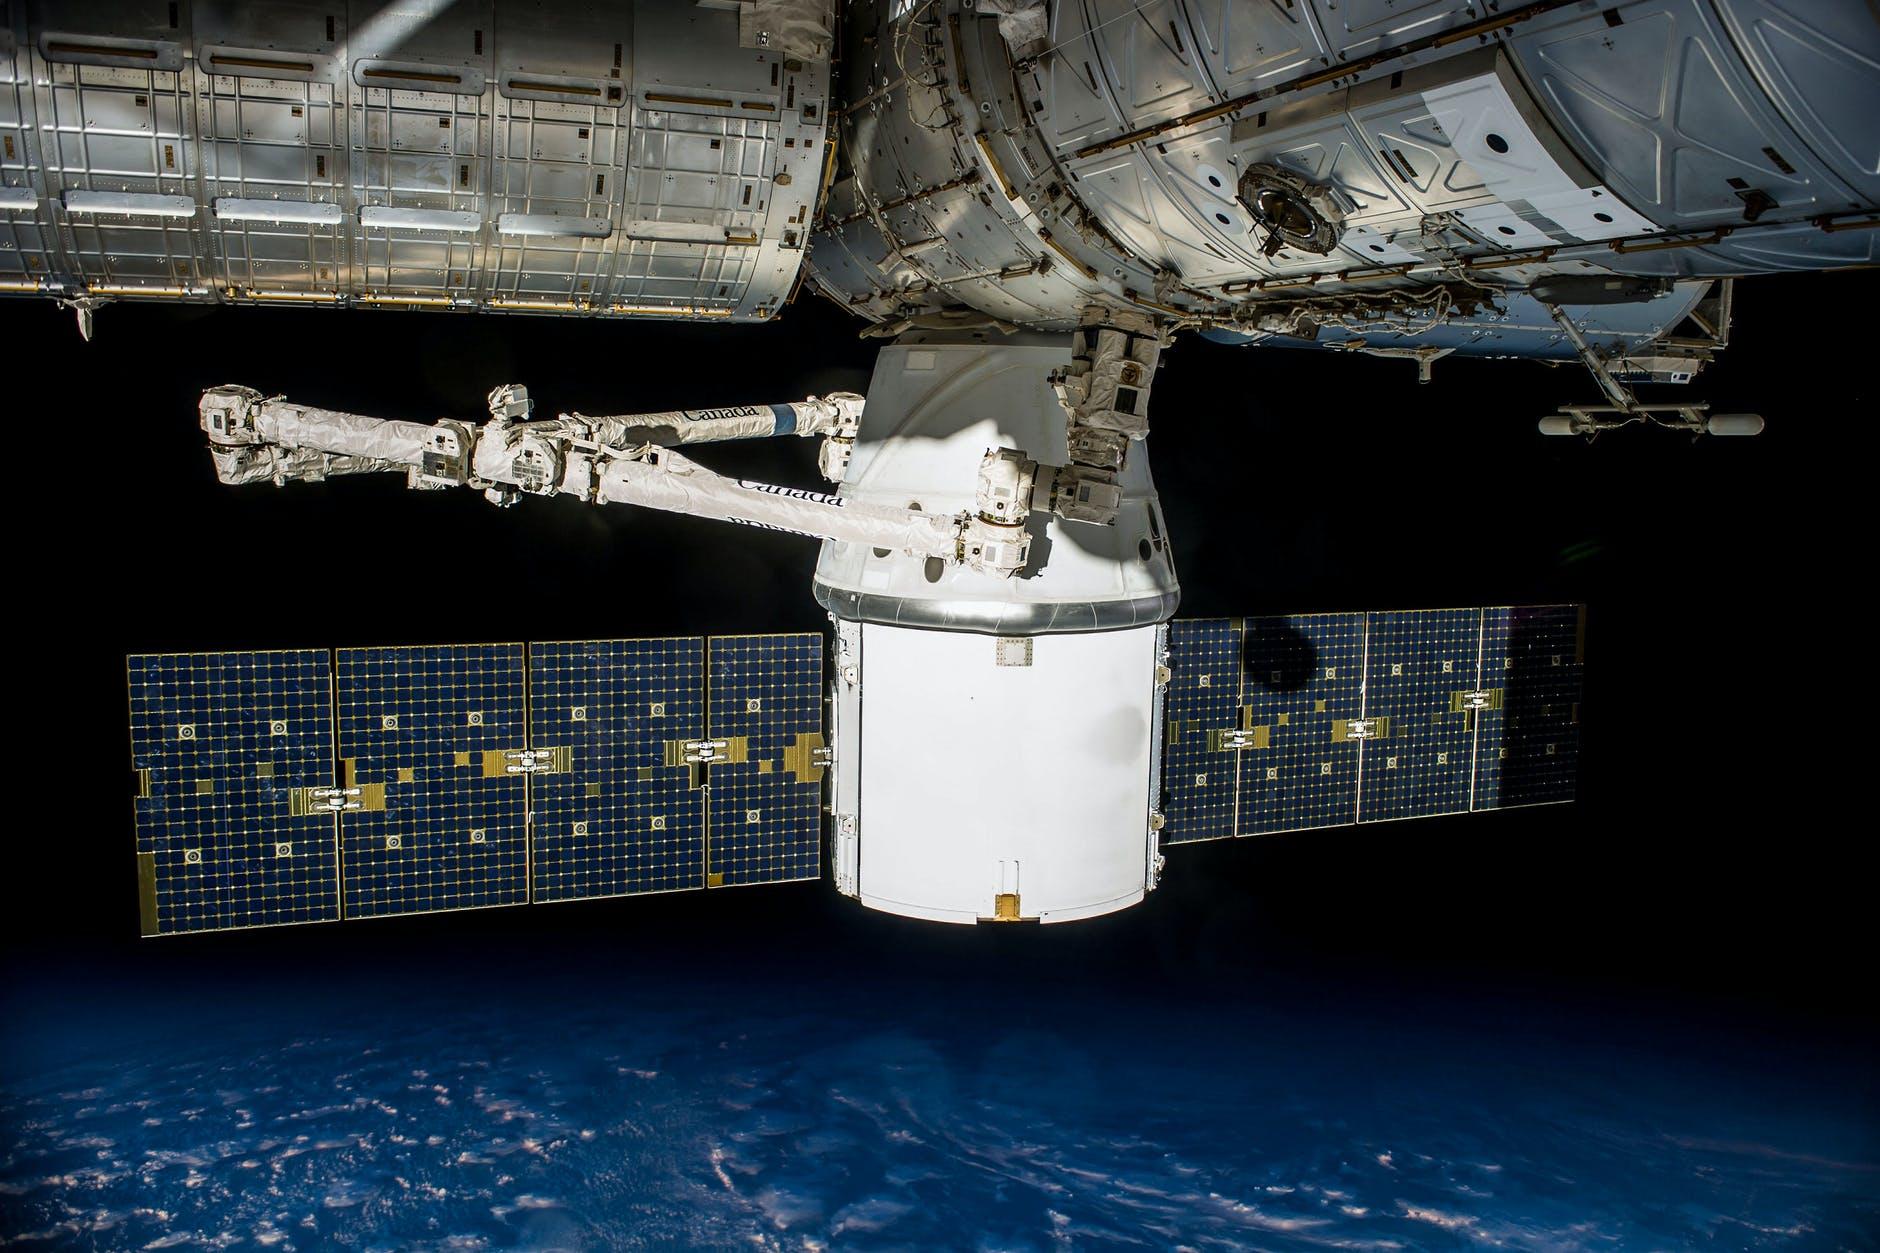 LiDAR Helping Land NASA On Mars